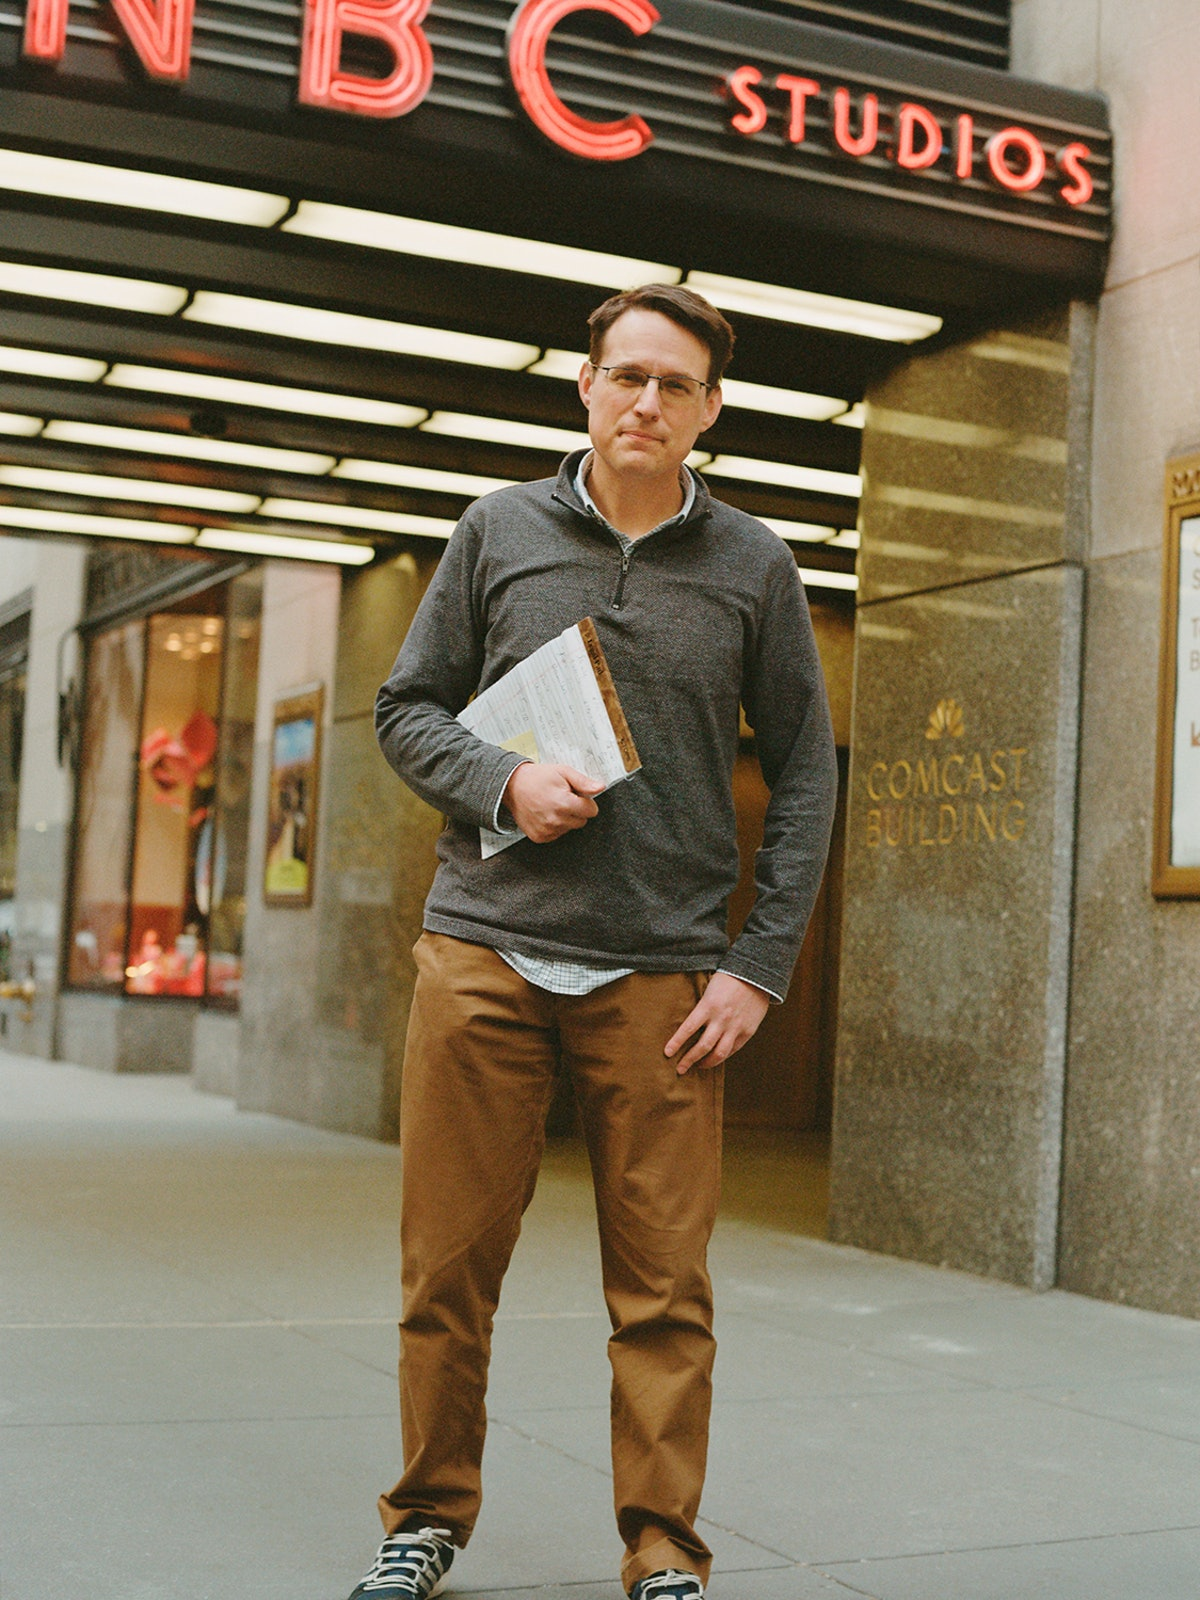 Steve Kornacki was photographed in  New York City in January 2021.